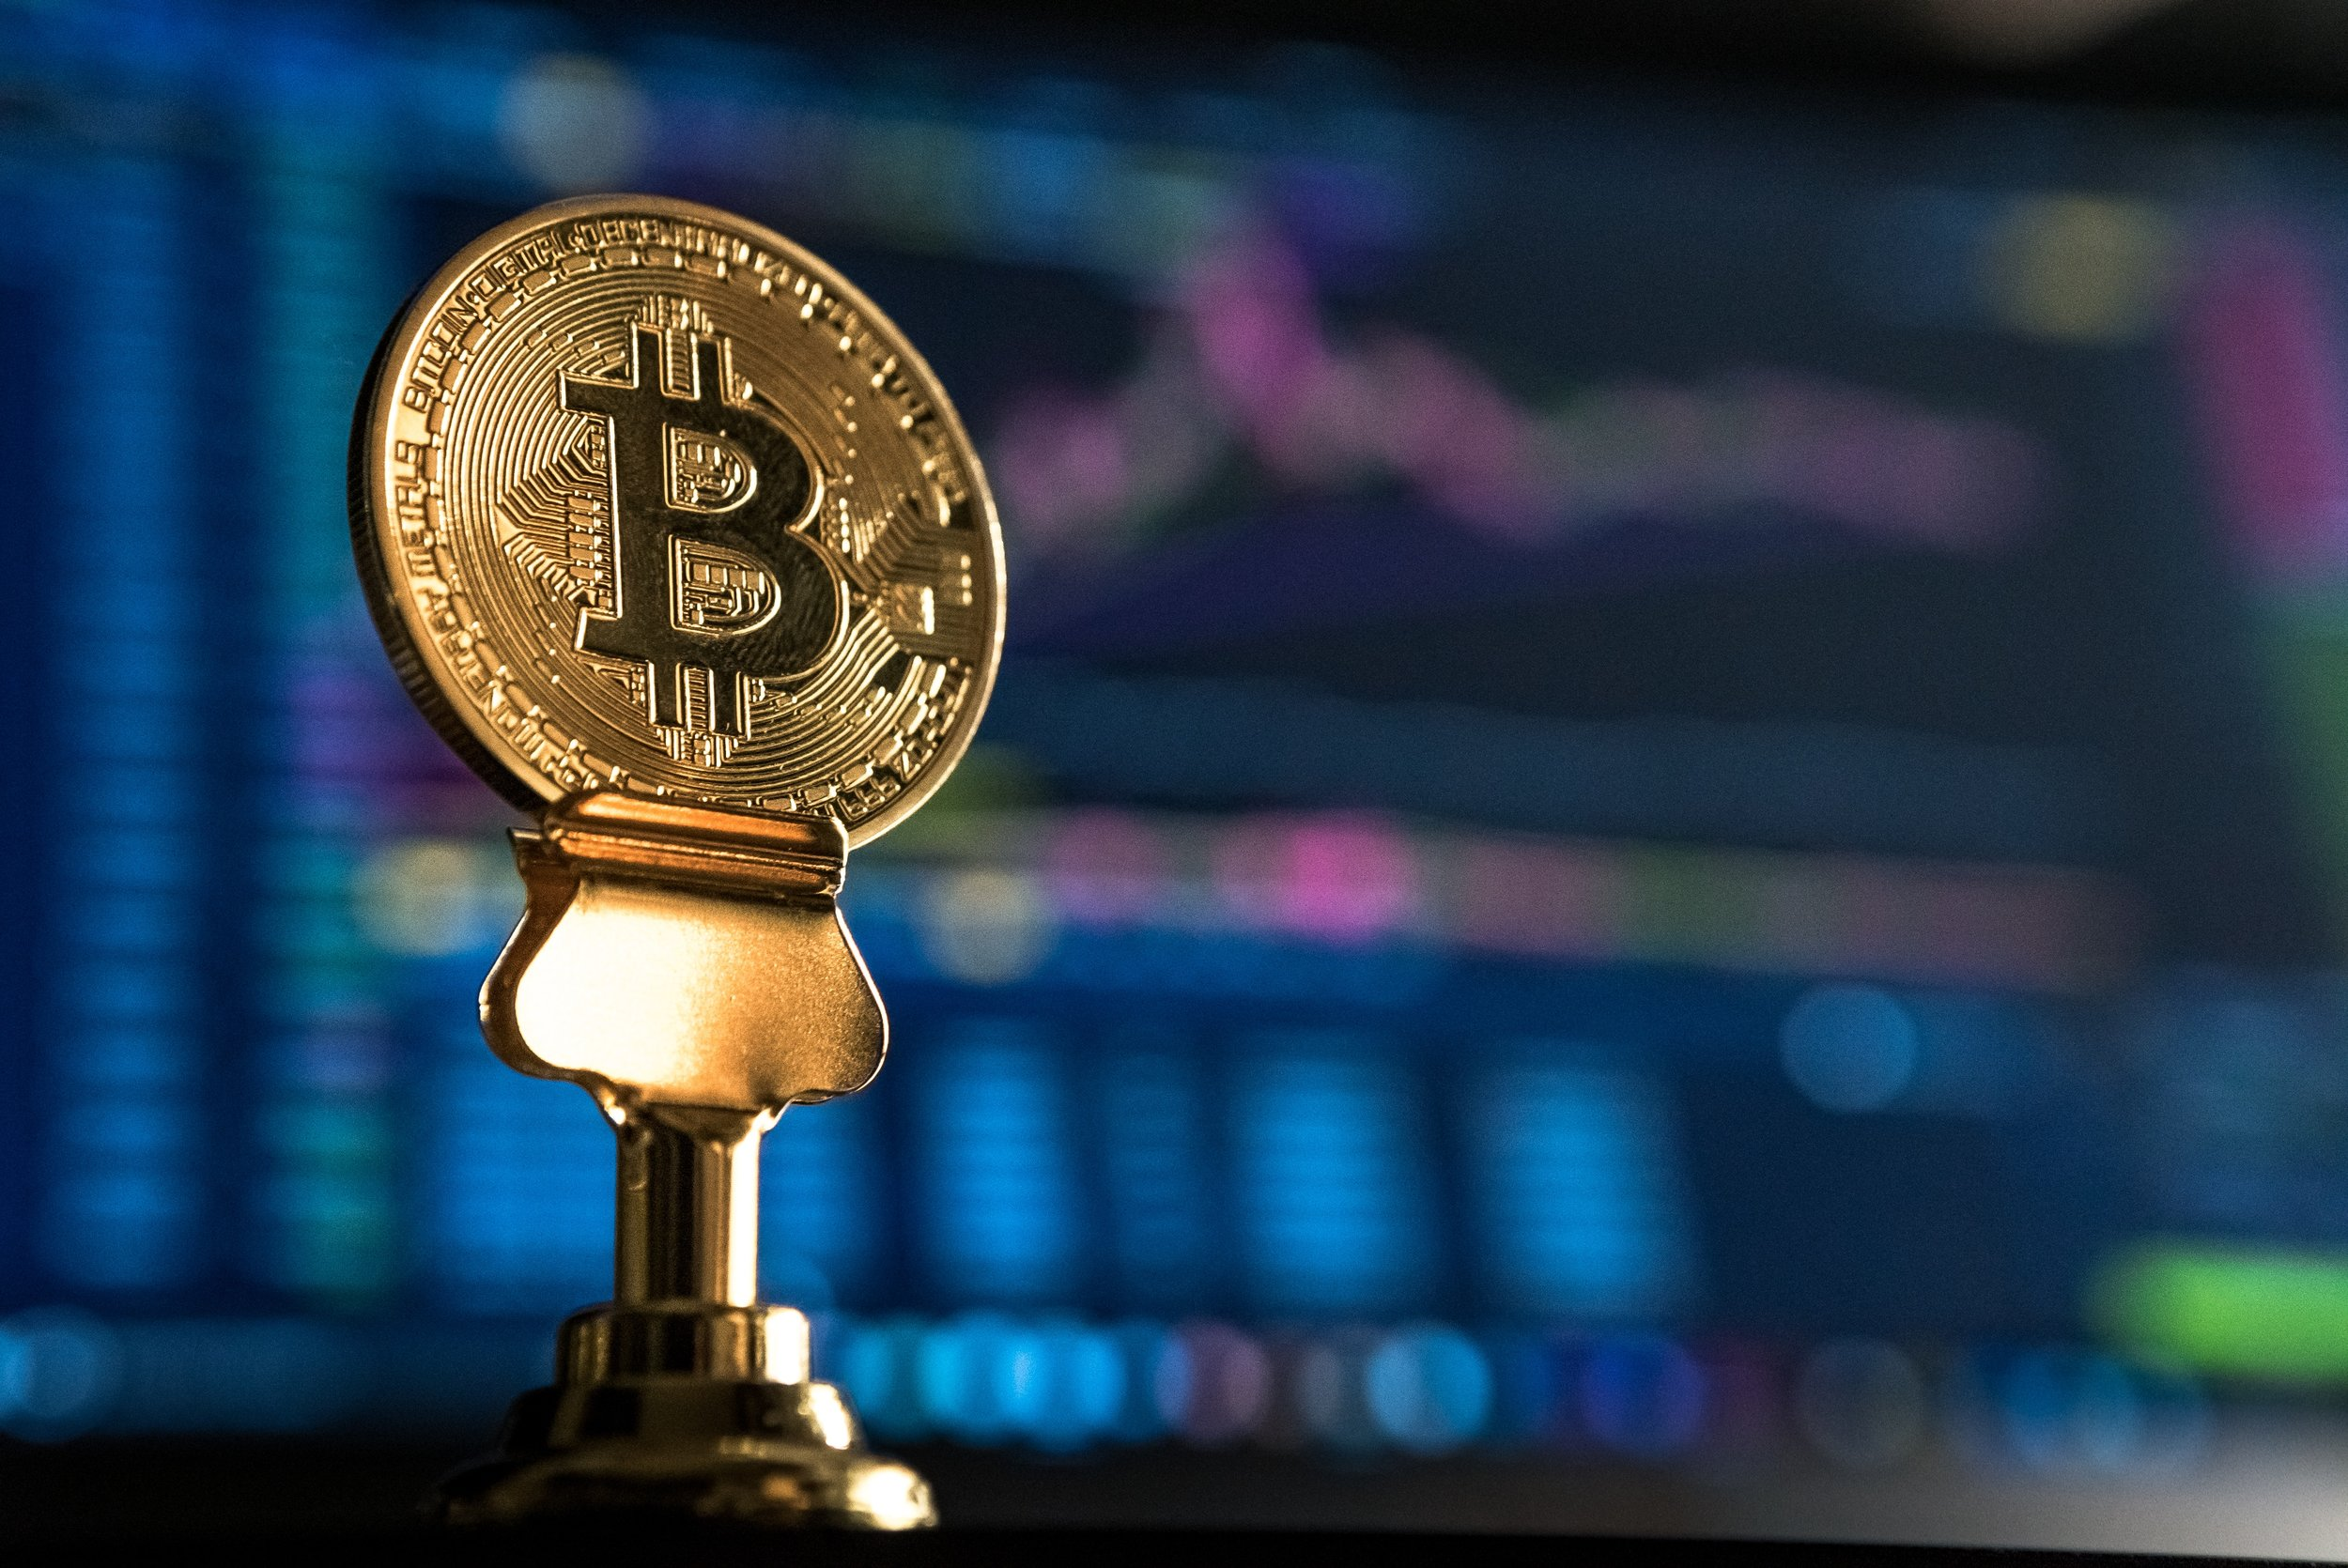 Tech-Park-Academy-Bitcoin-Past-Present-Future.jpg